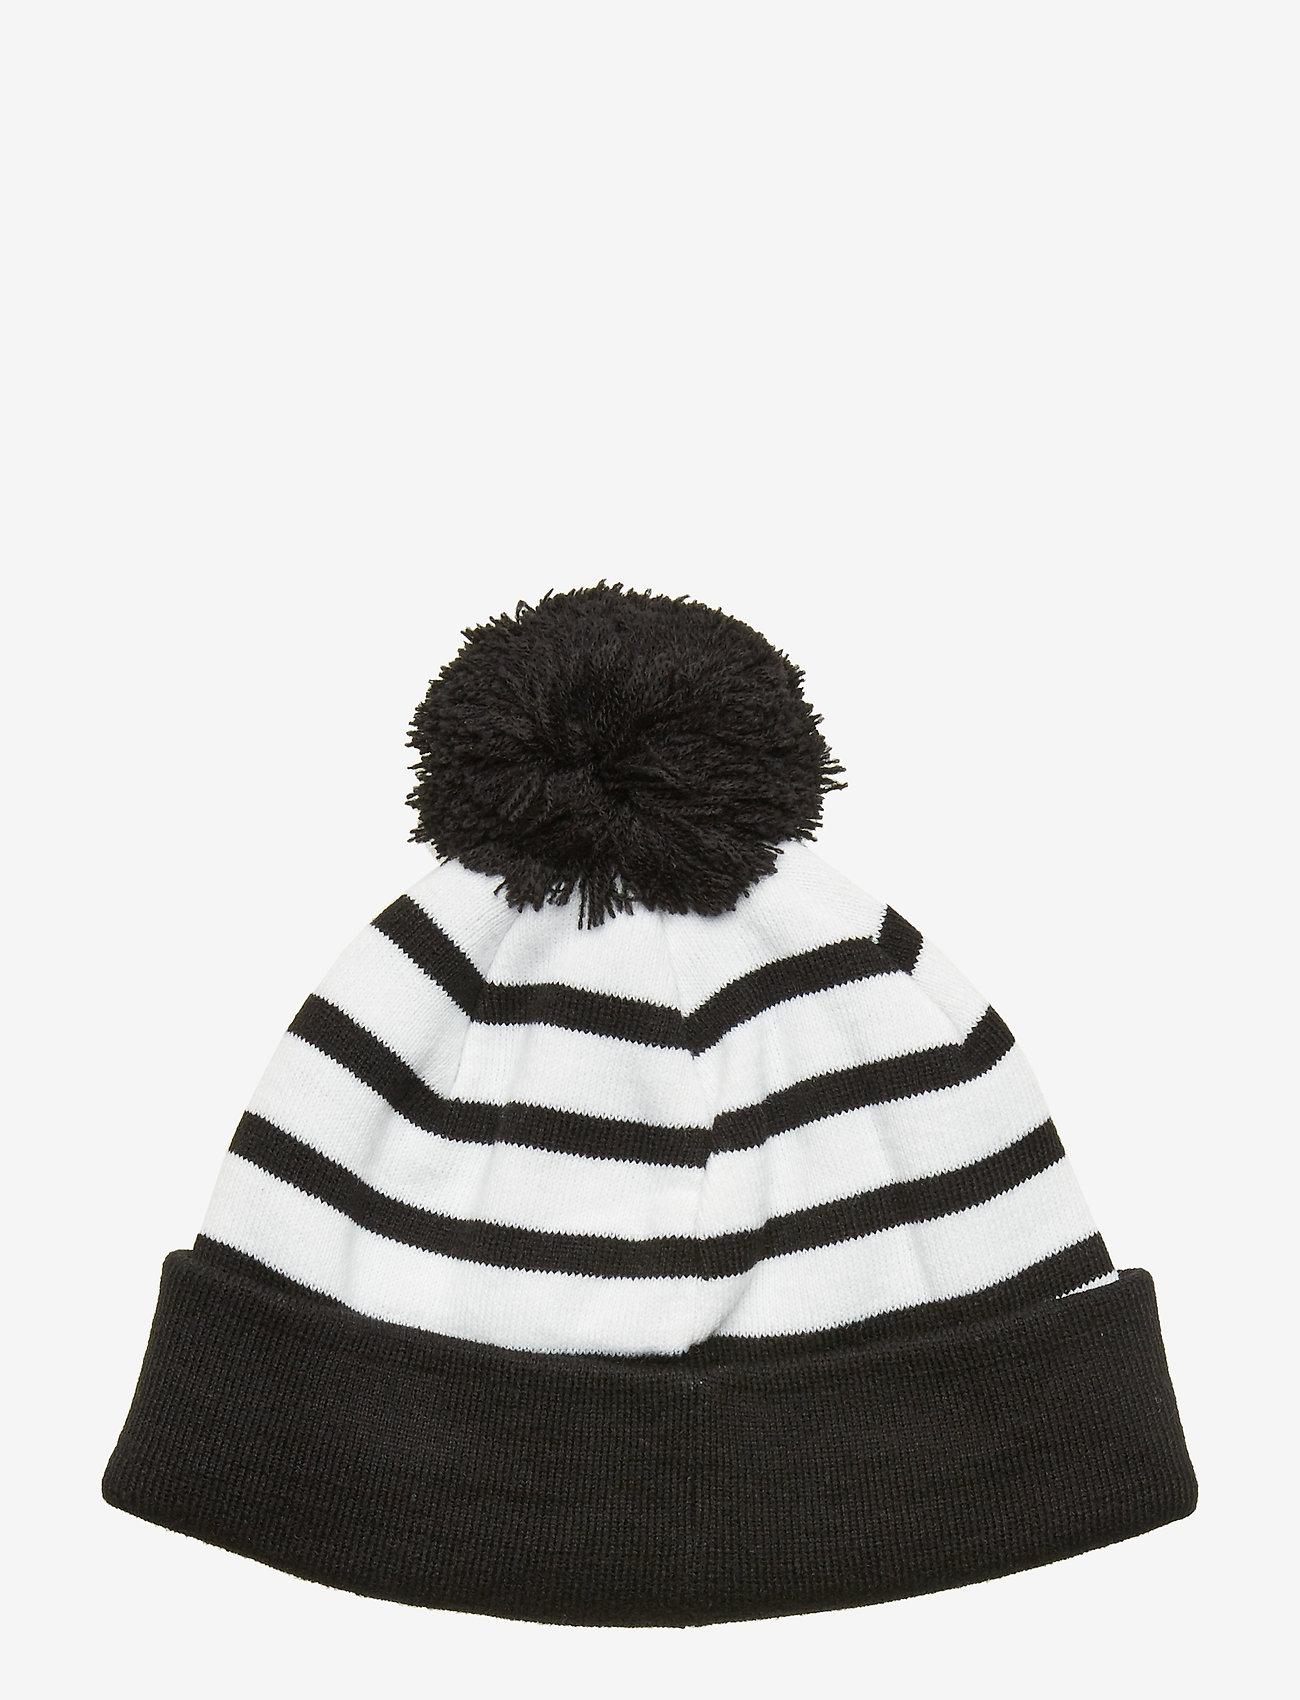 J. Lindeberg Ski - Stripe Ball Beanie-Acrylic - beanies - black - 1